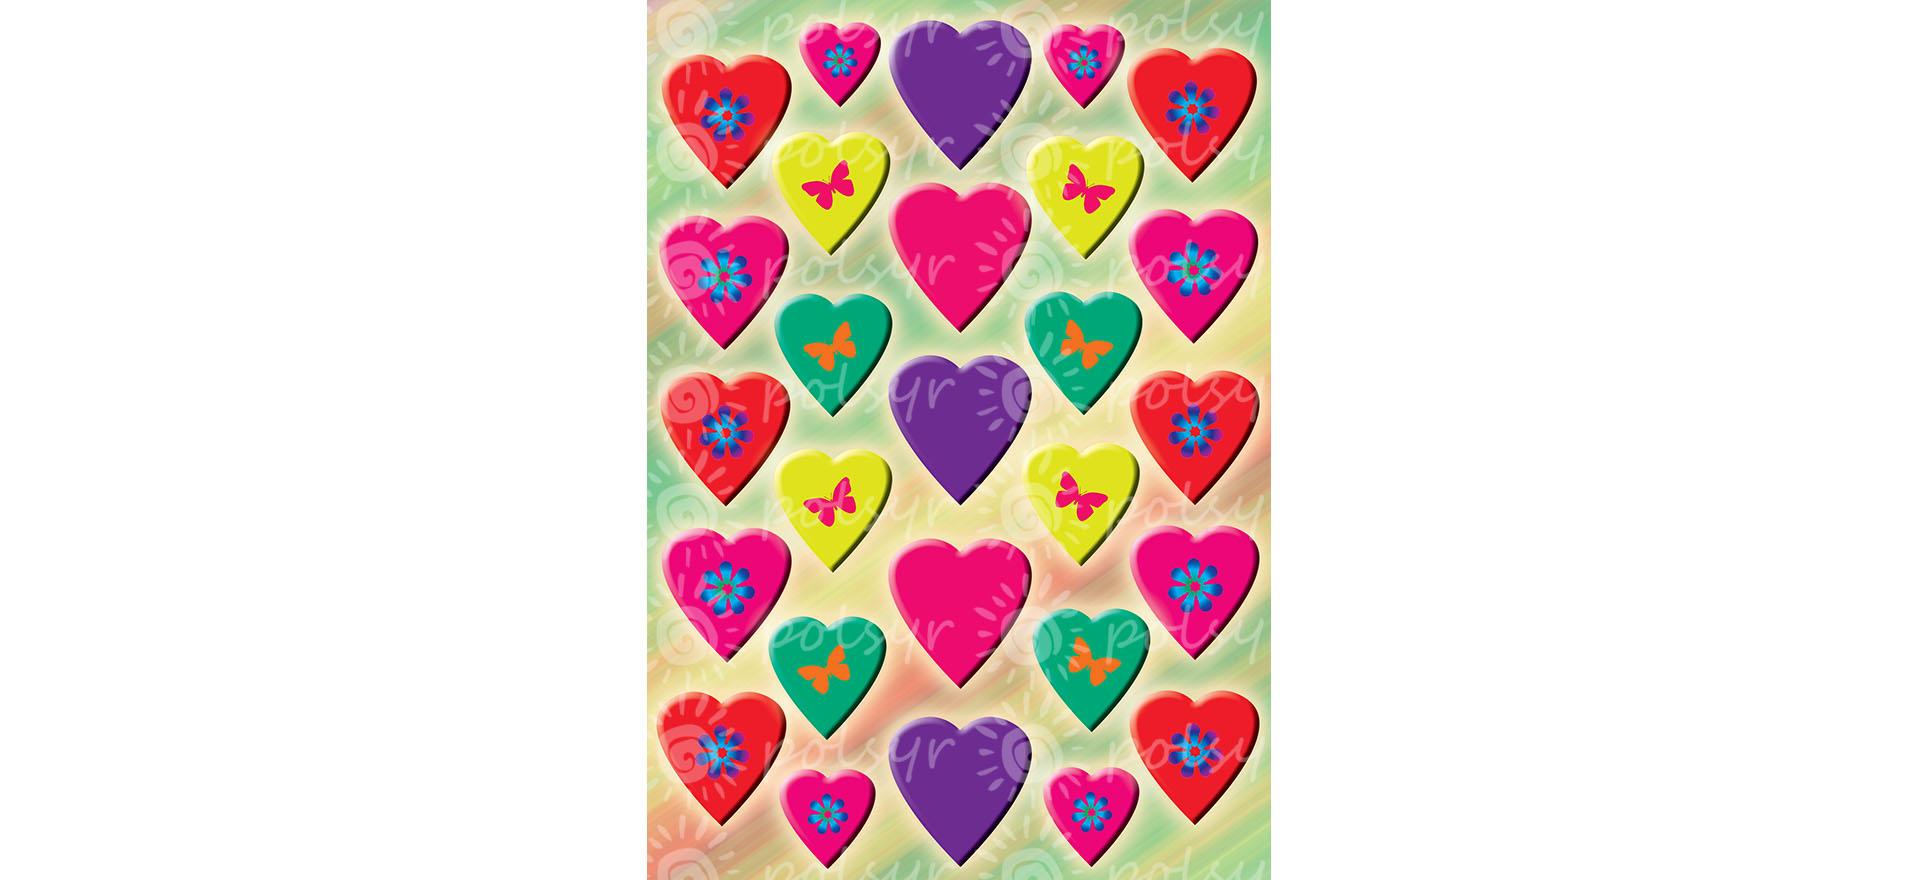 naklejki-serca-duze-polsyr-10